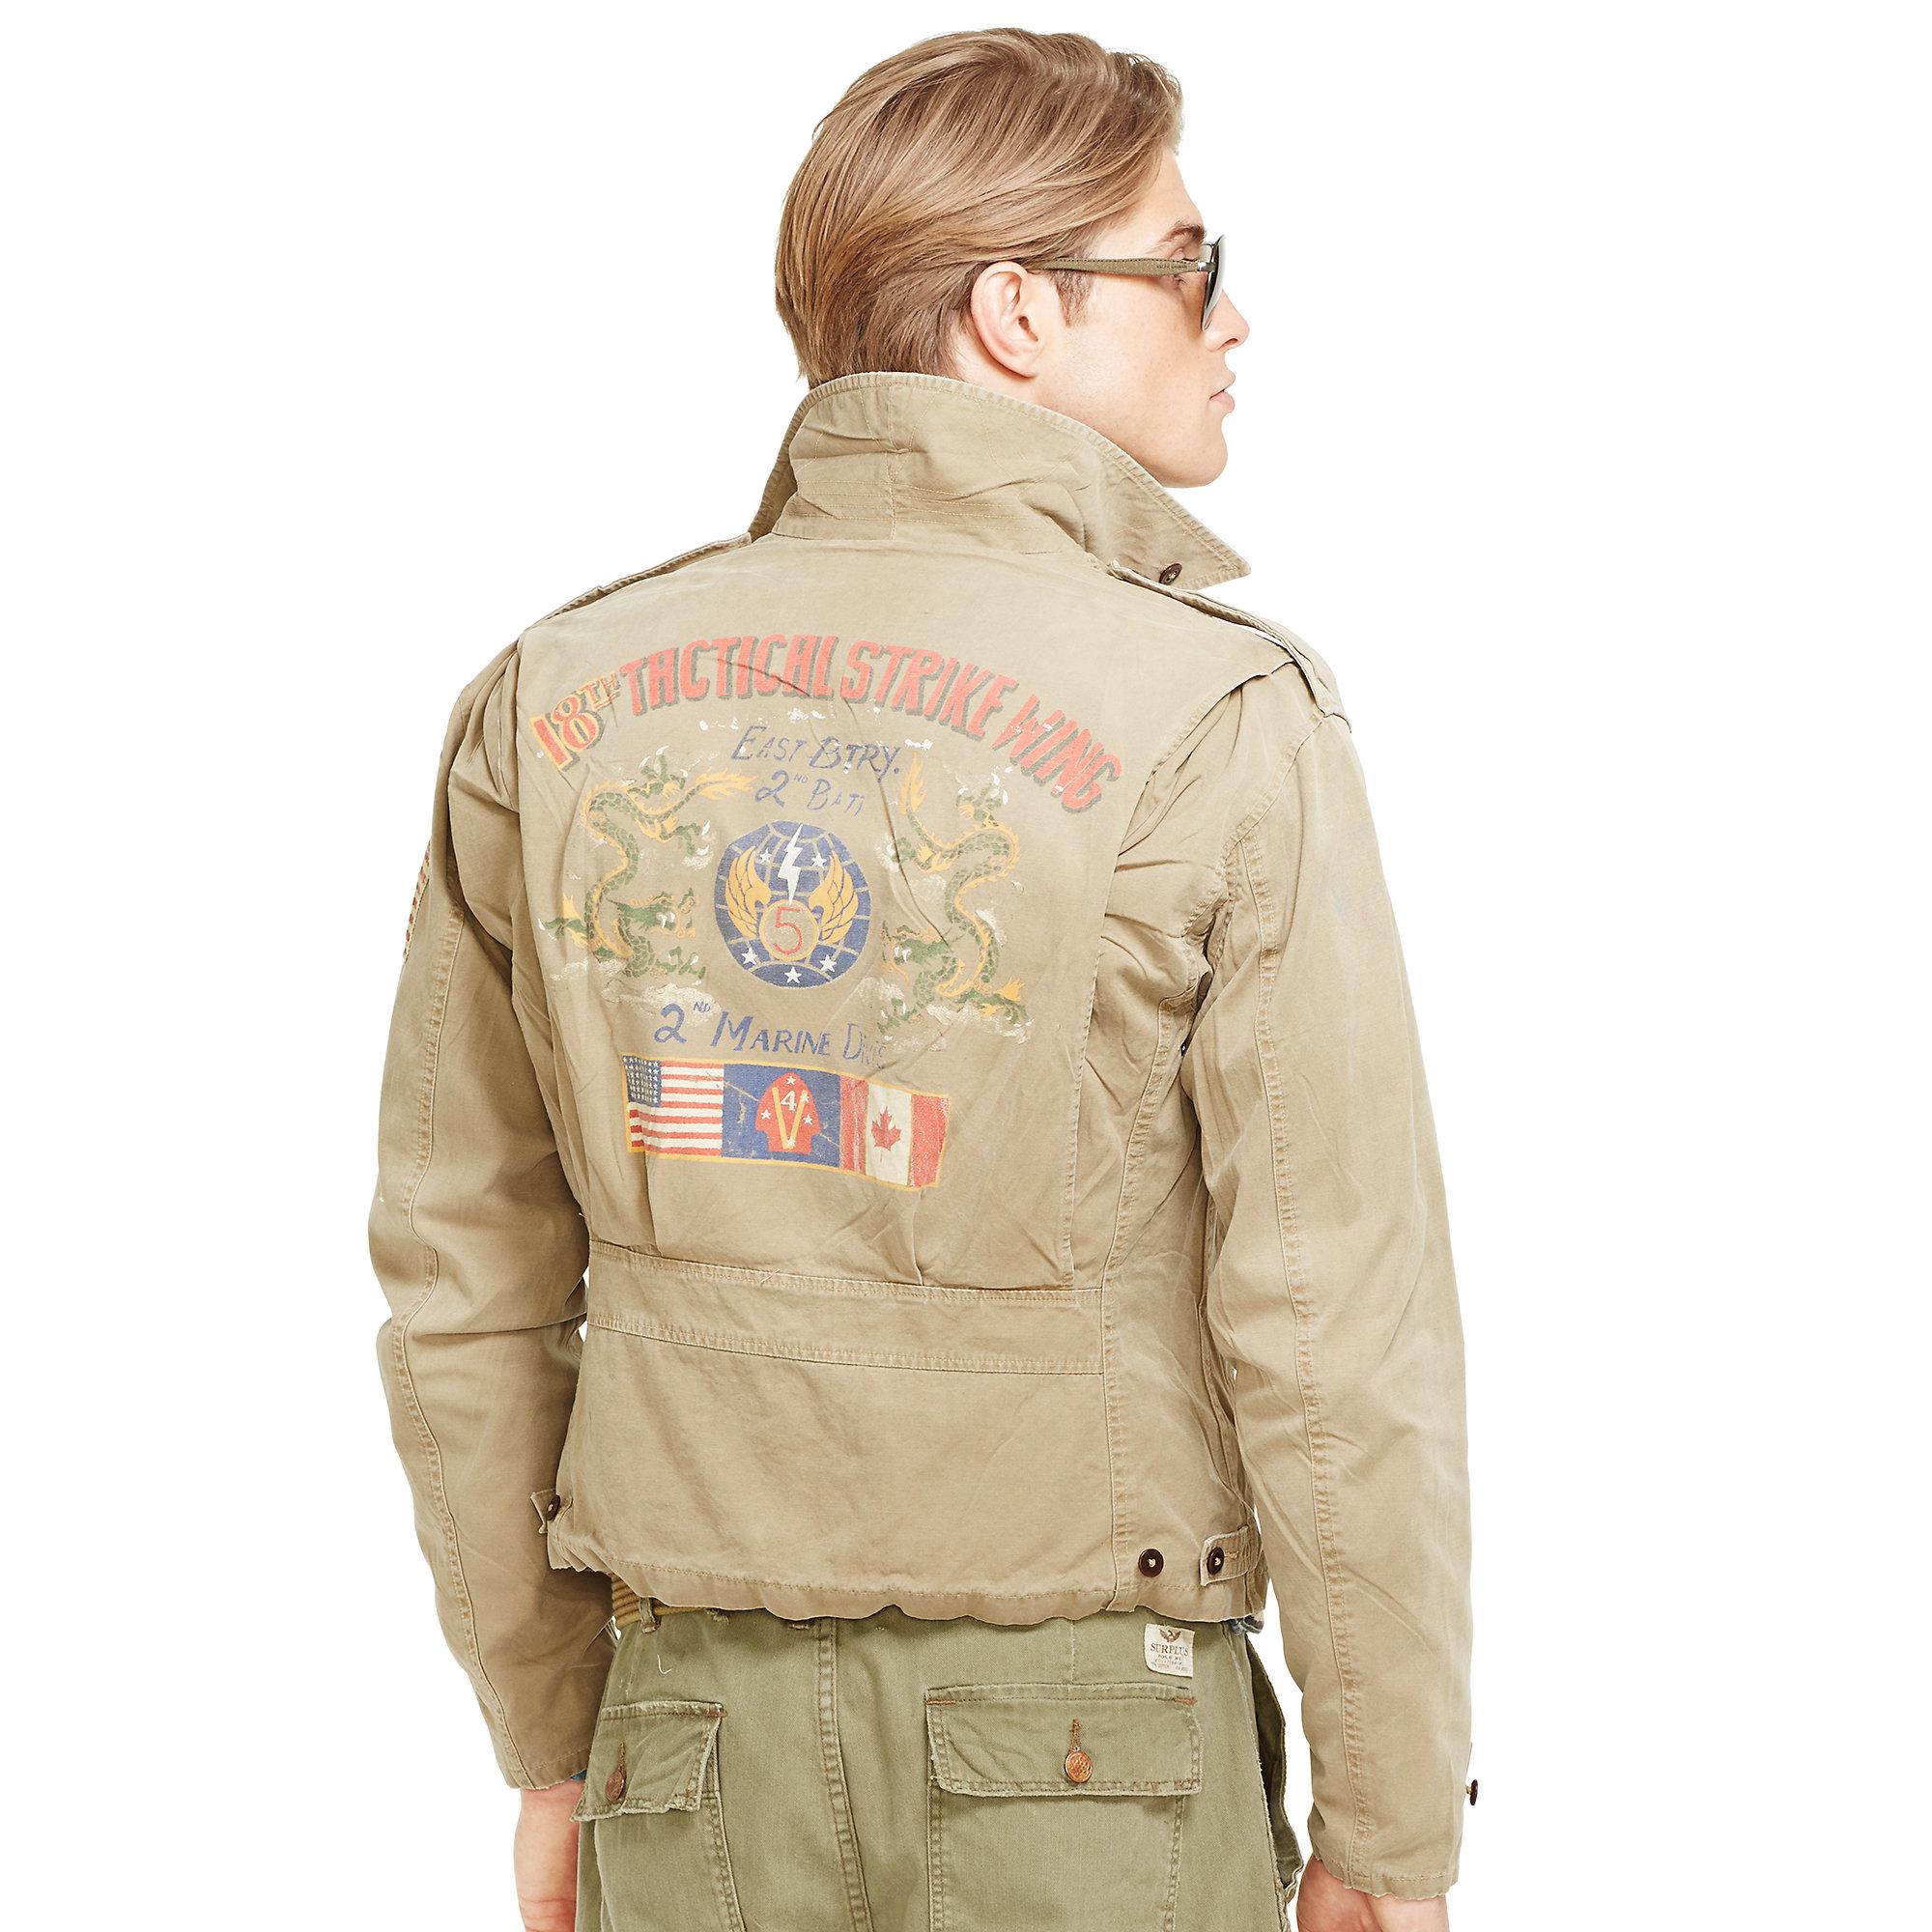 becdbd471 ... czech lyst polo ralph lauren canvas m41 jacket in natural for men 5314f  c1b53